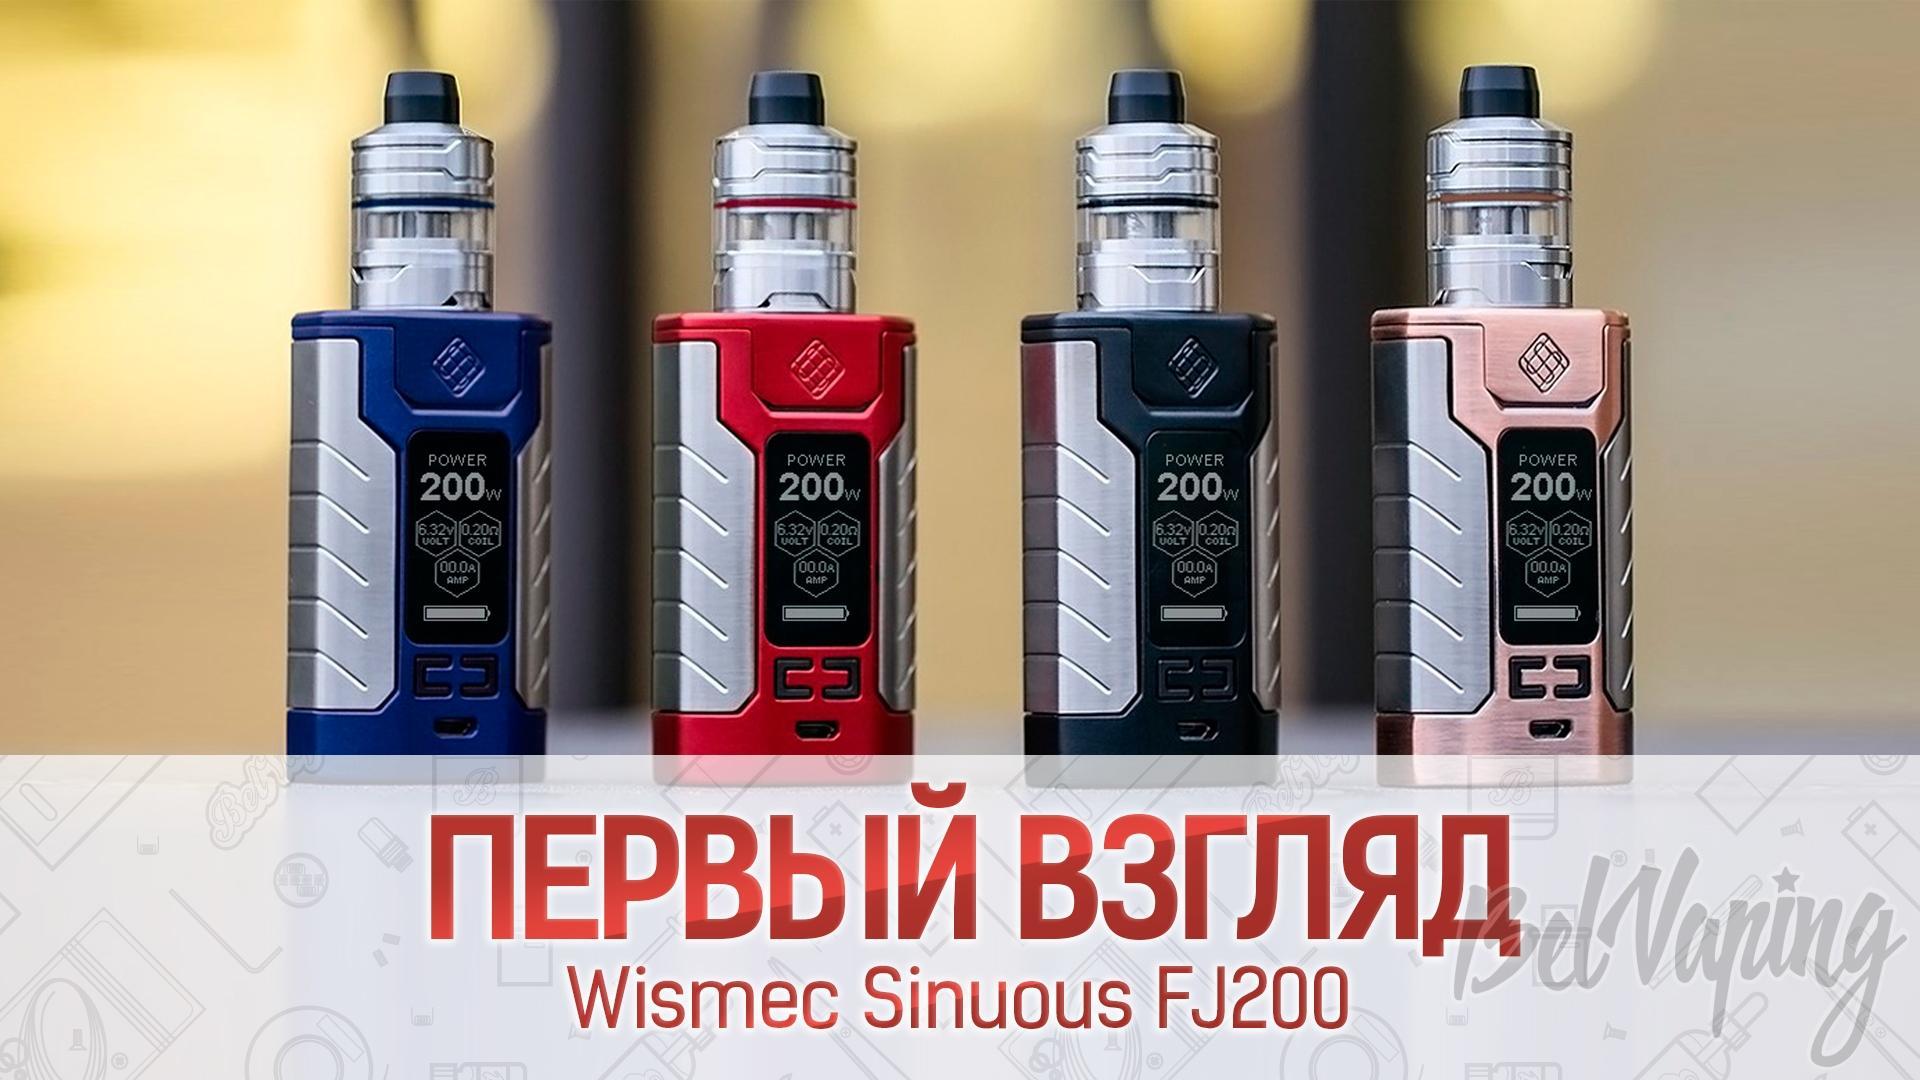 Wismec Sinuous FJ200. Первый взгляд